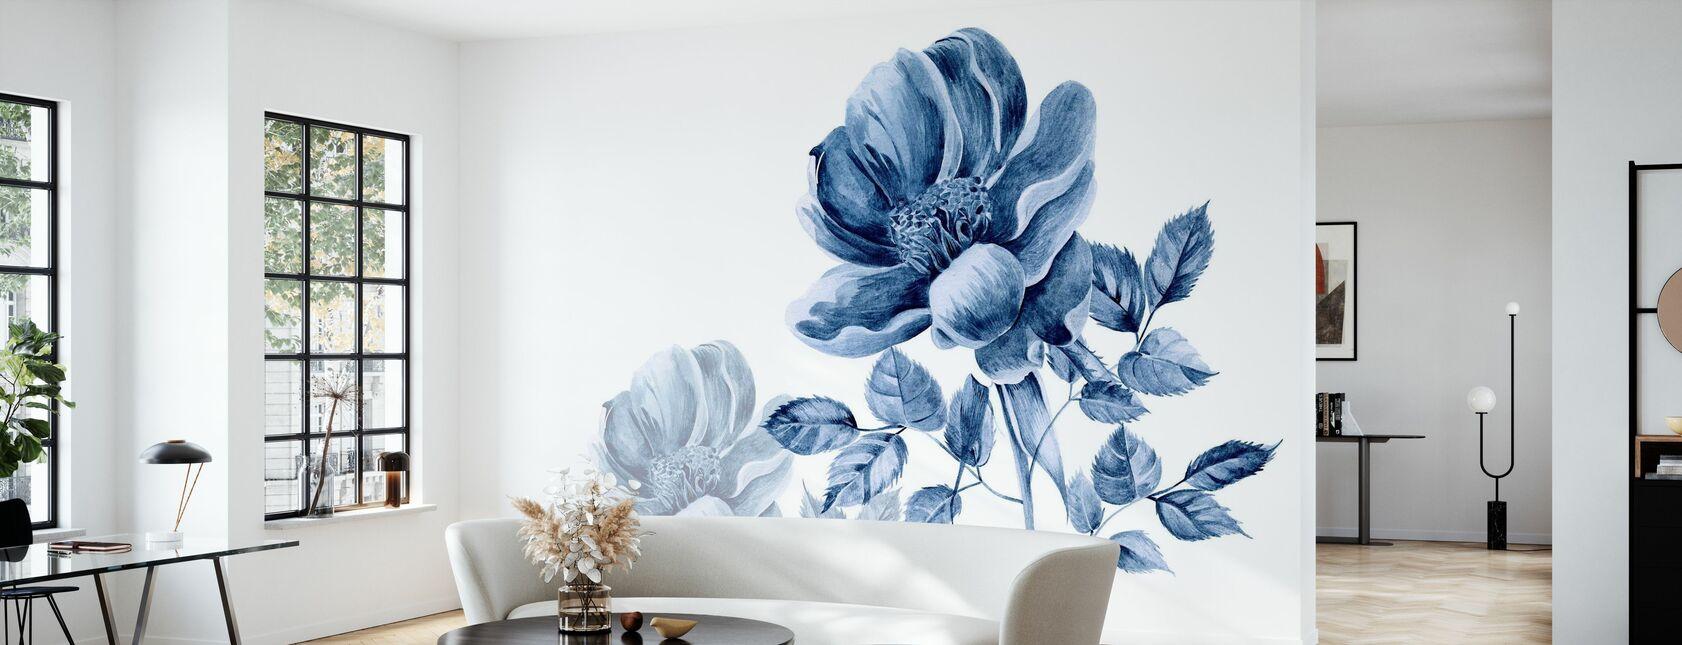 Florafou - Wallpaper - Living Room